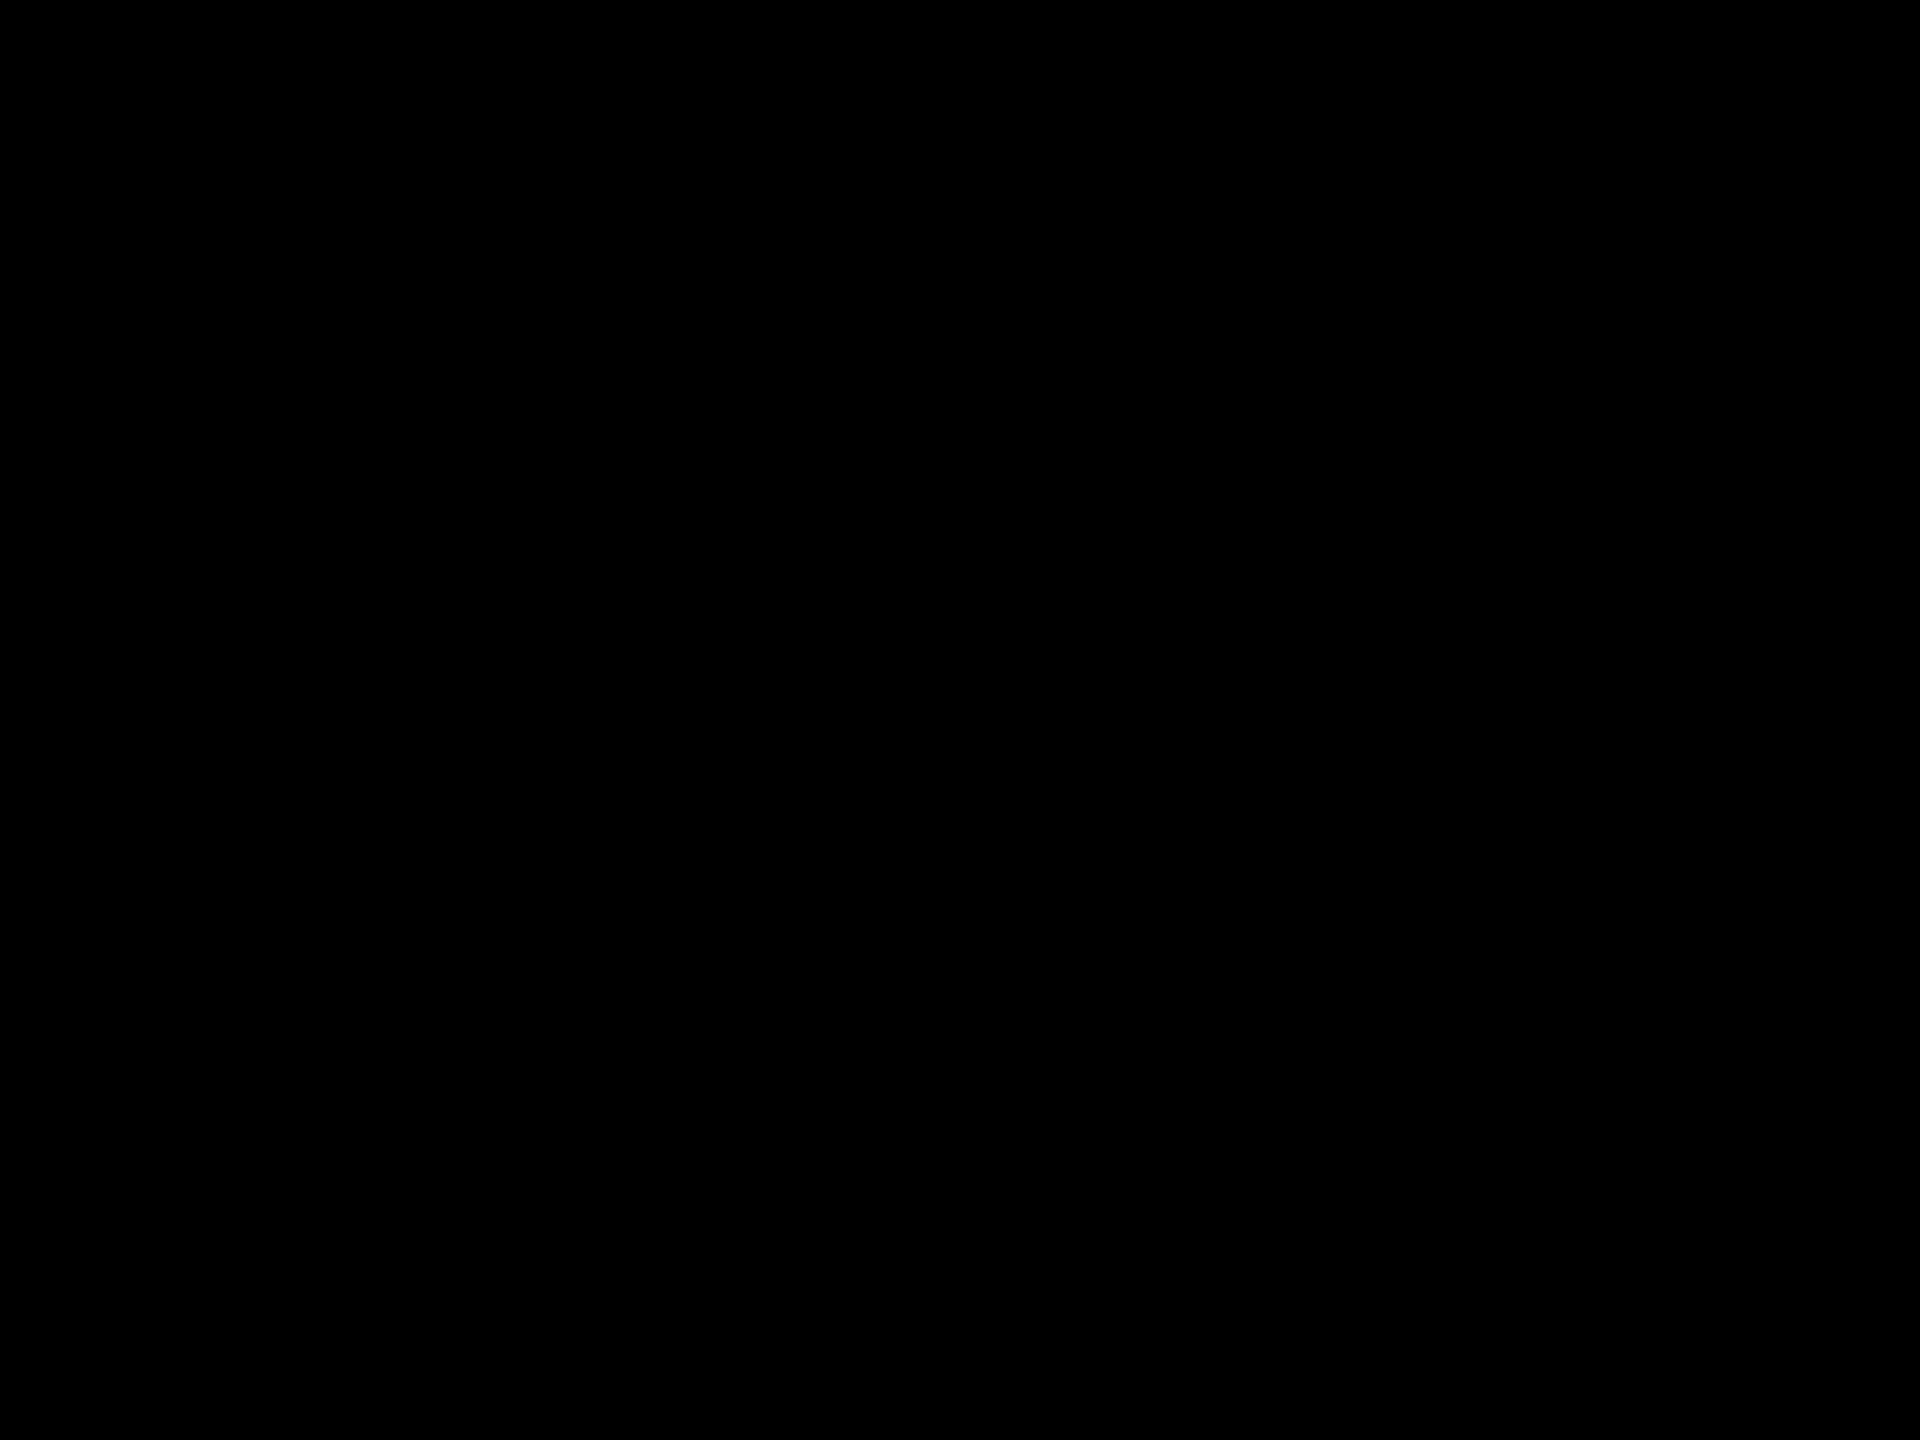 P de F 02.06 (200)